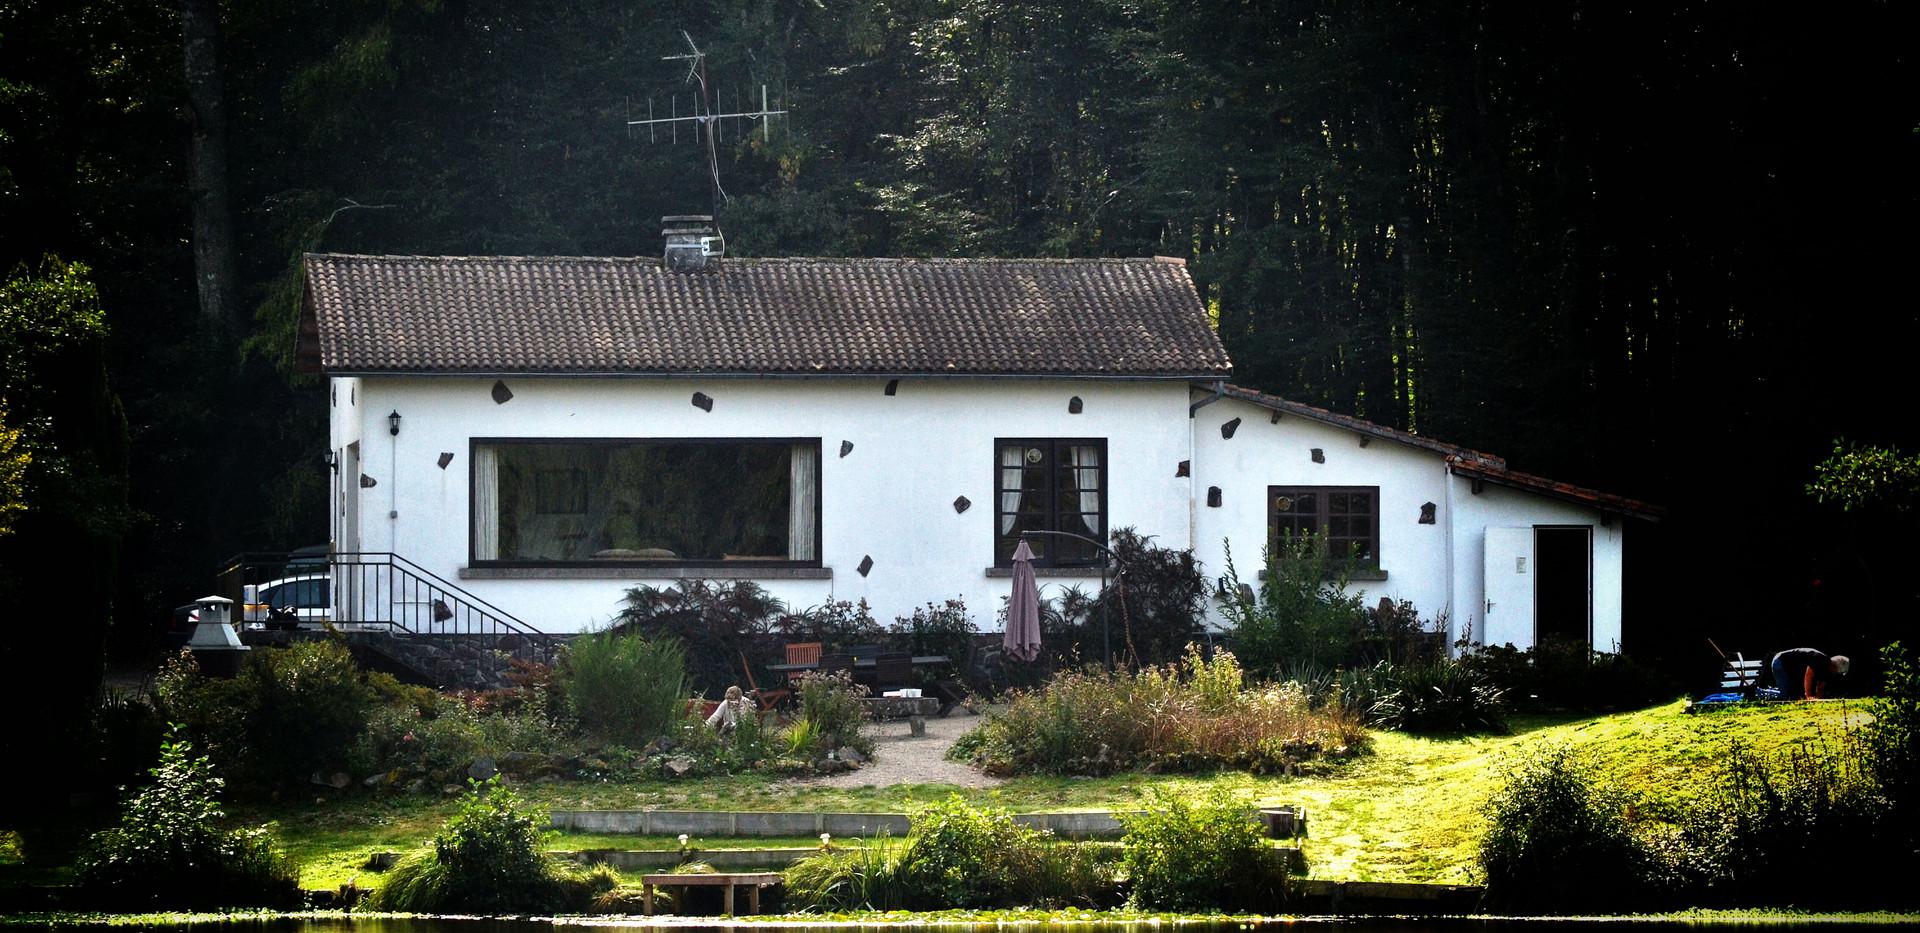 Les Gravelles House by lake